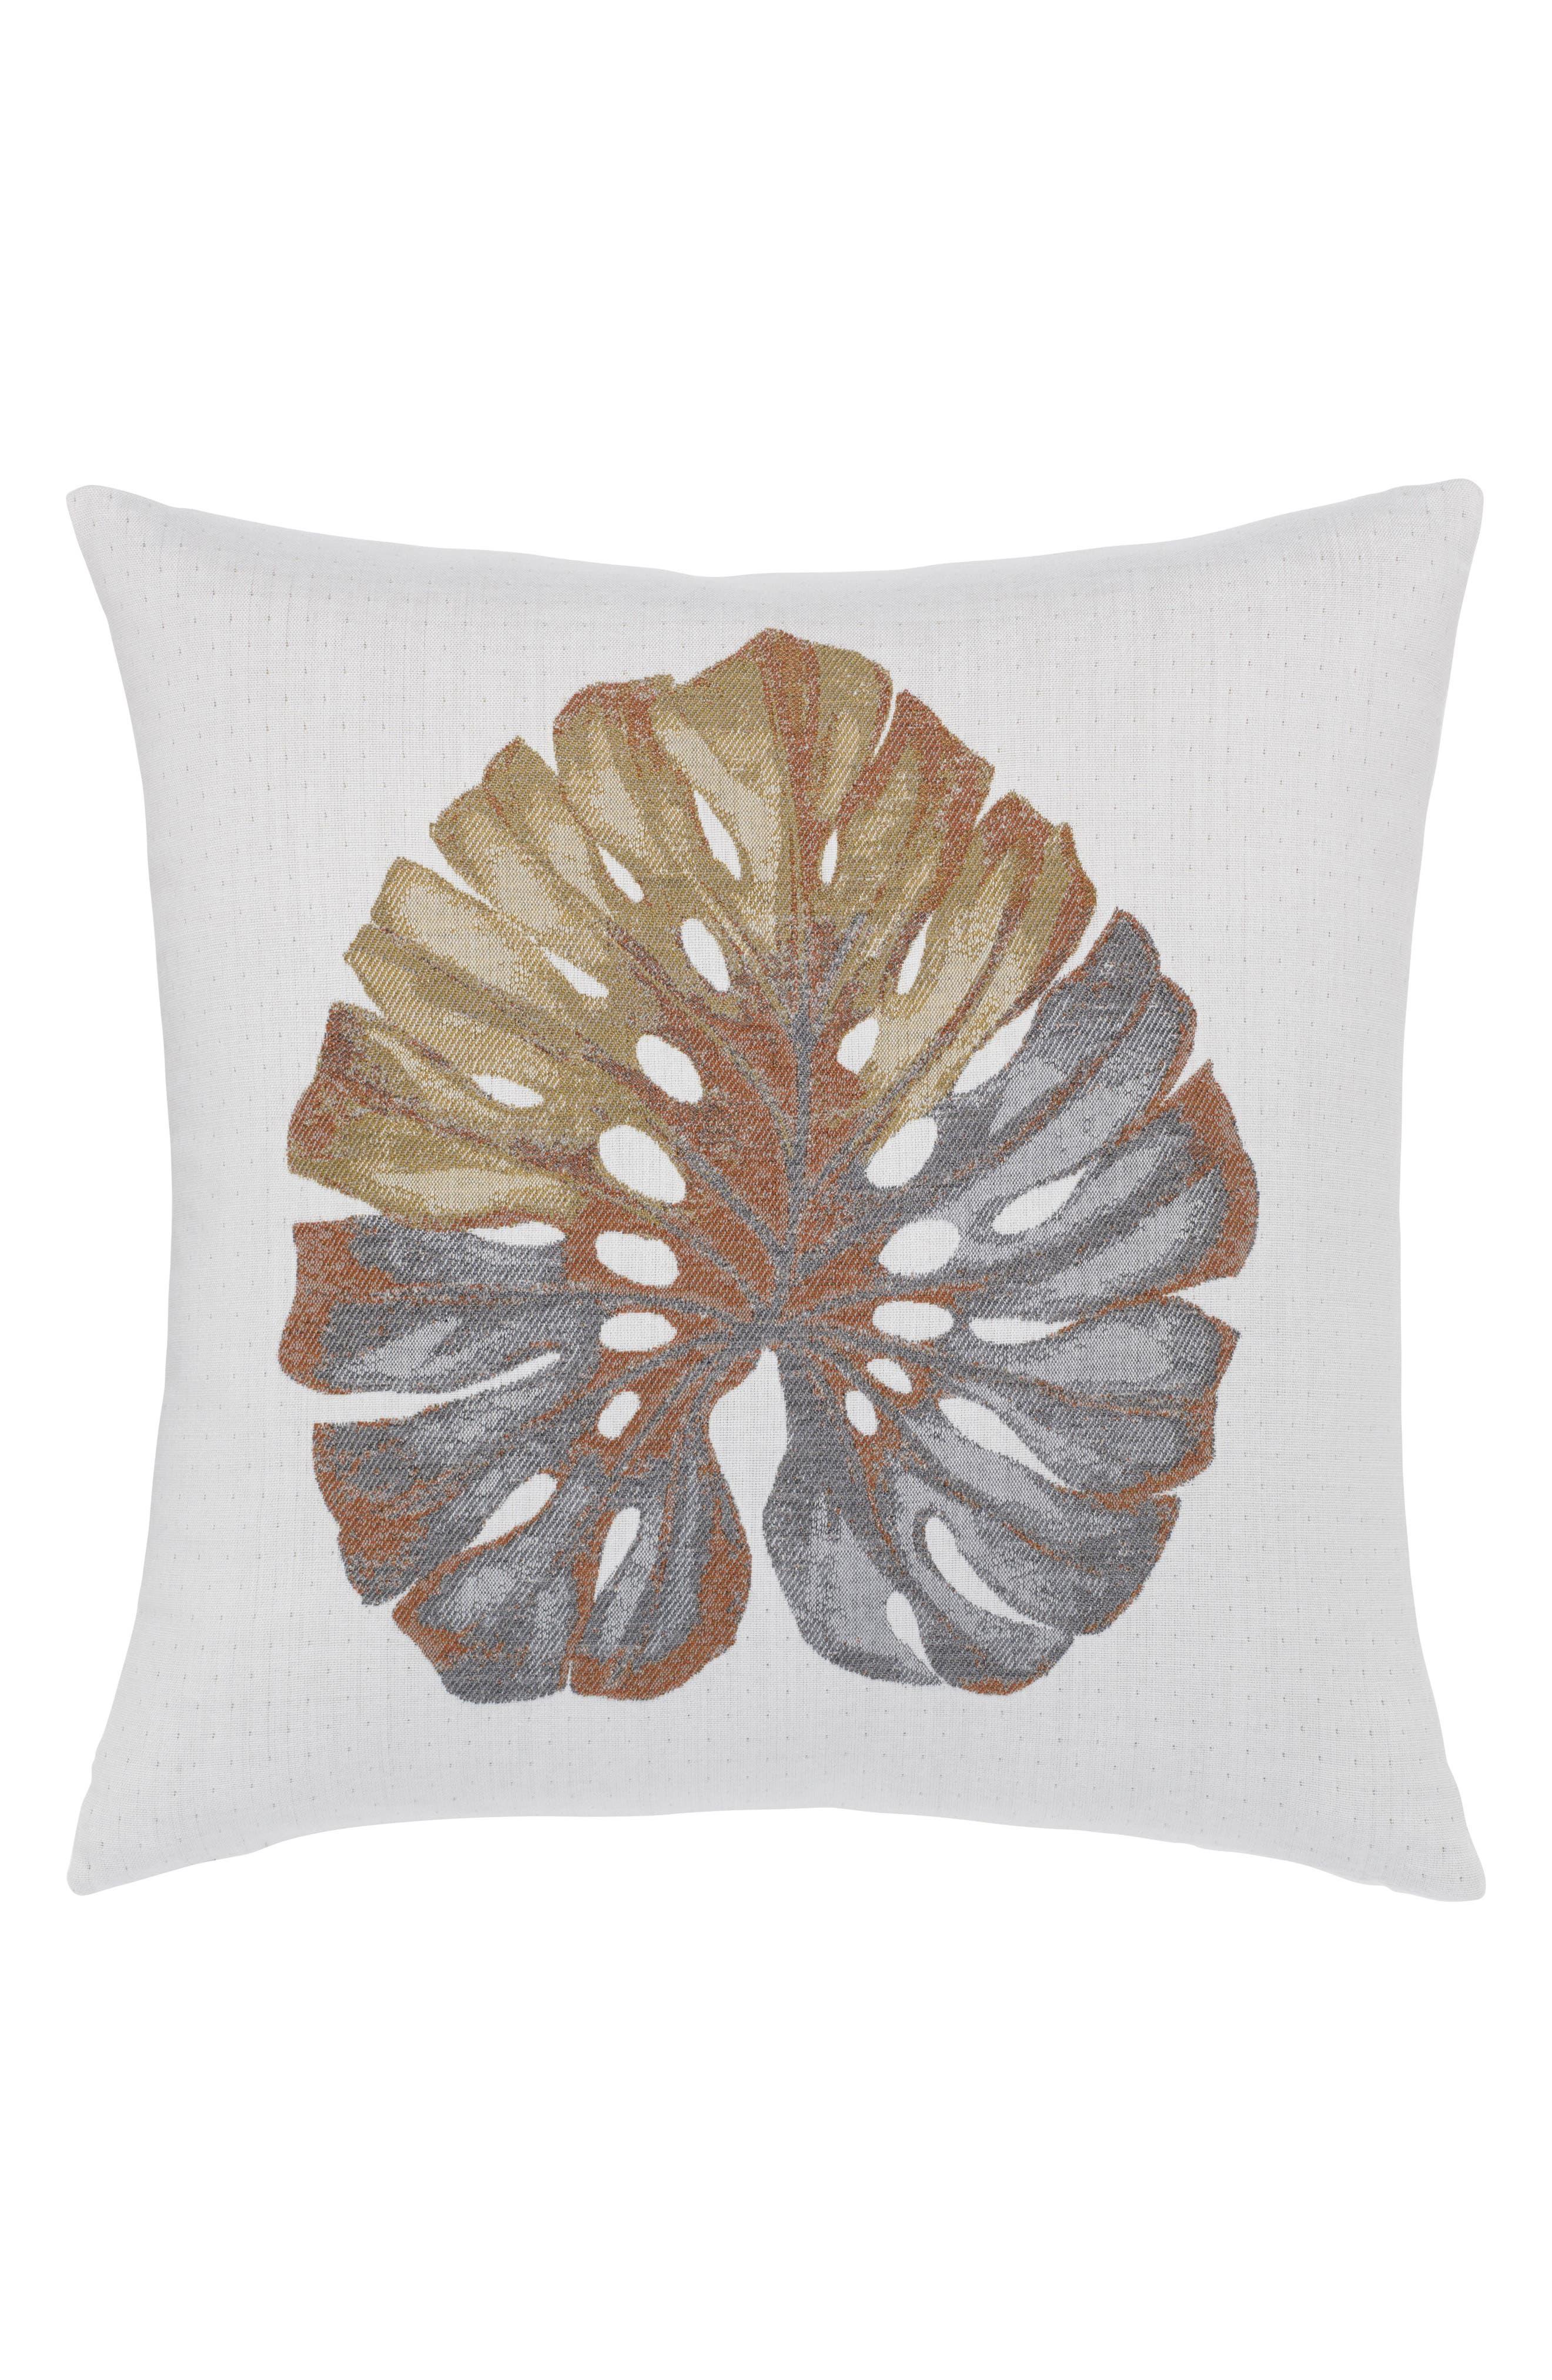 Metallic Leaf Indoor/Outdoor Accent Pillow,                         Main,                         color, Gold/ Grey